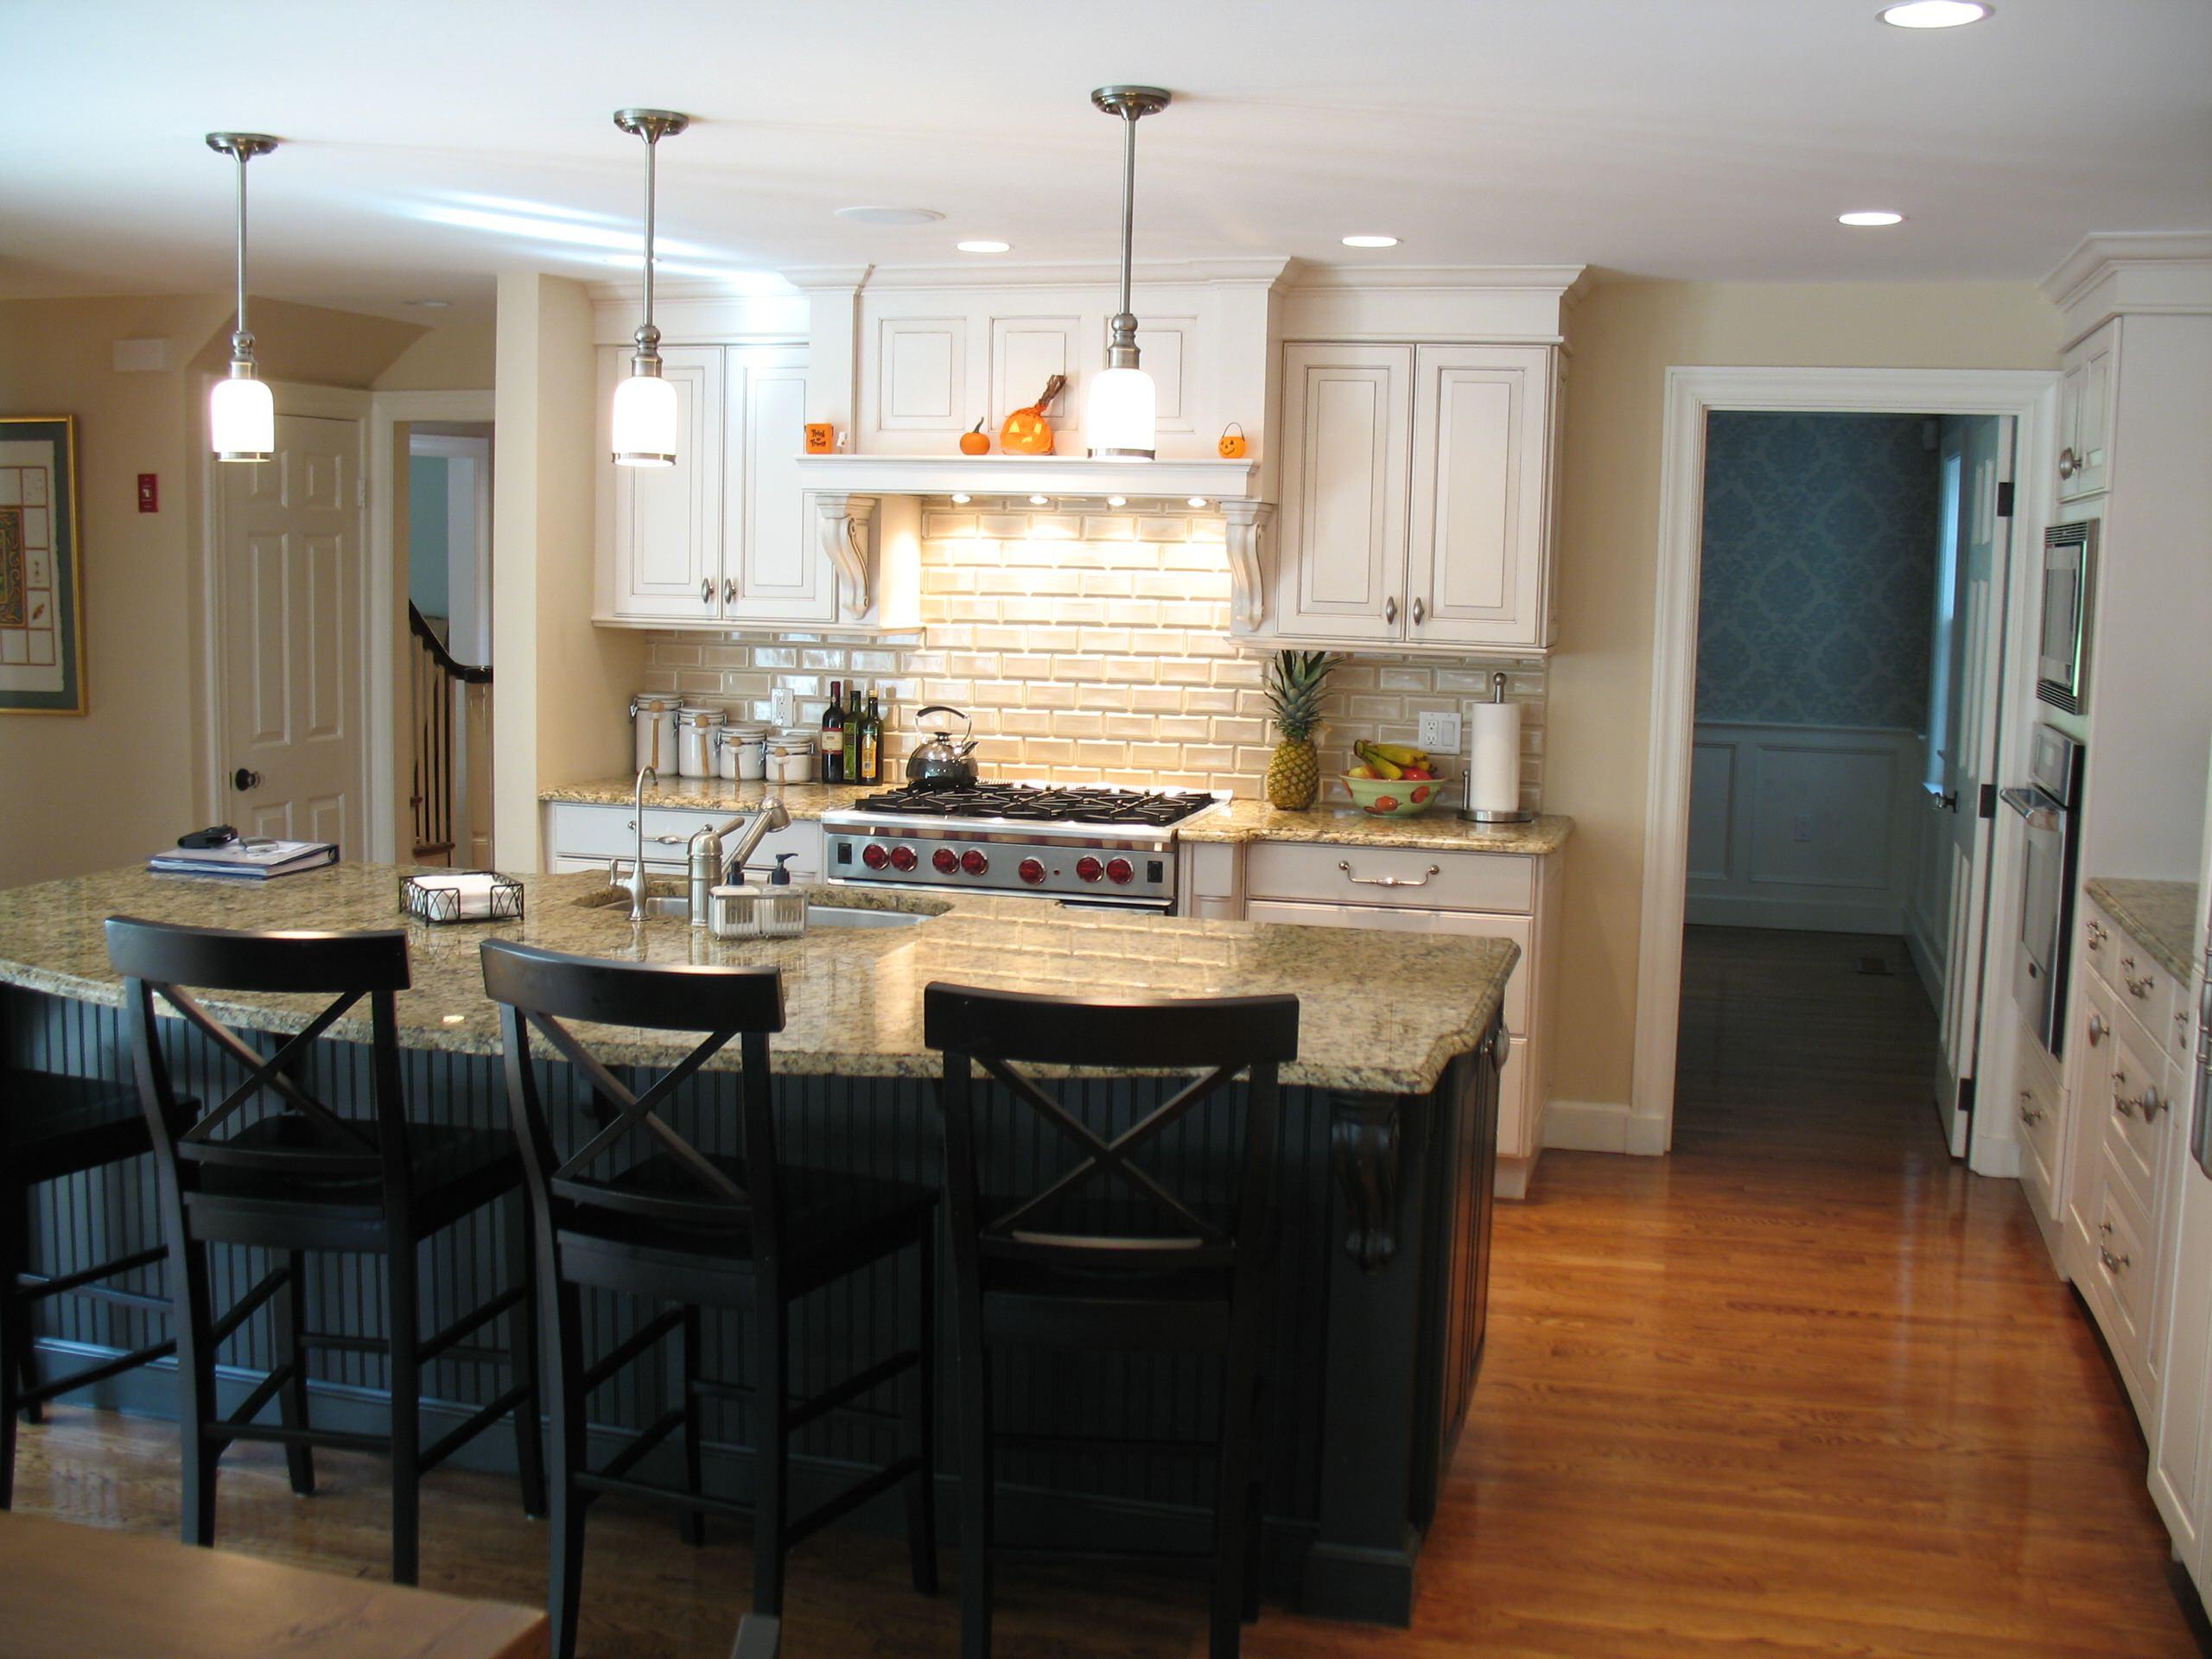 38 Thackeray, Wellesley, MA - Kitchen & Family Rm